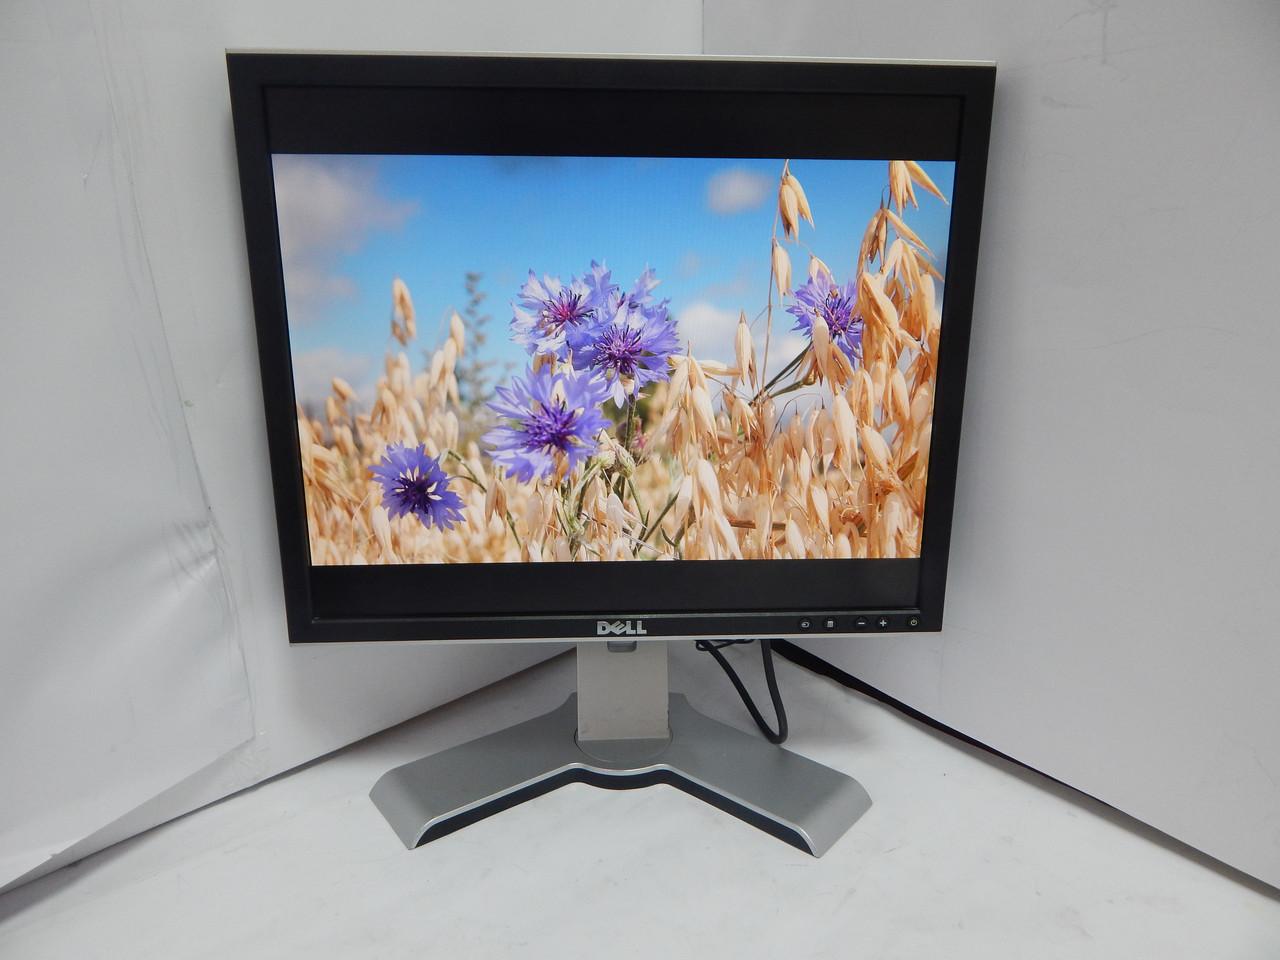 Монитор 19 дюймов DELL 1908FP 1280x1024, DVI, VGA, USB